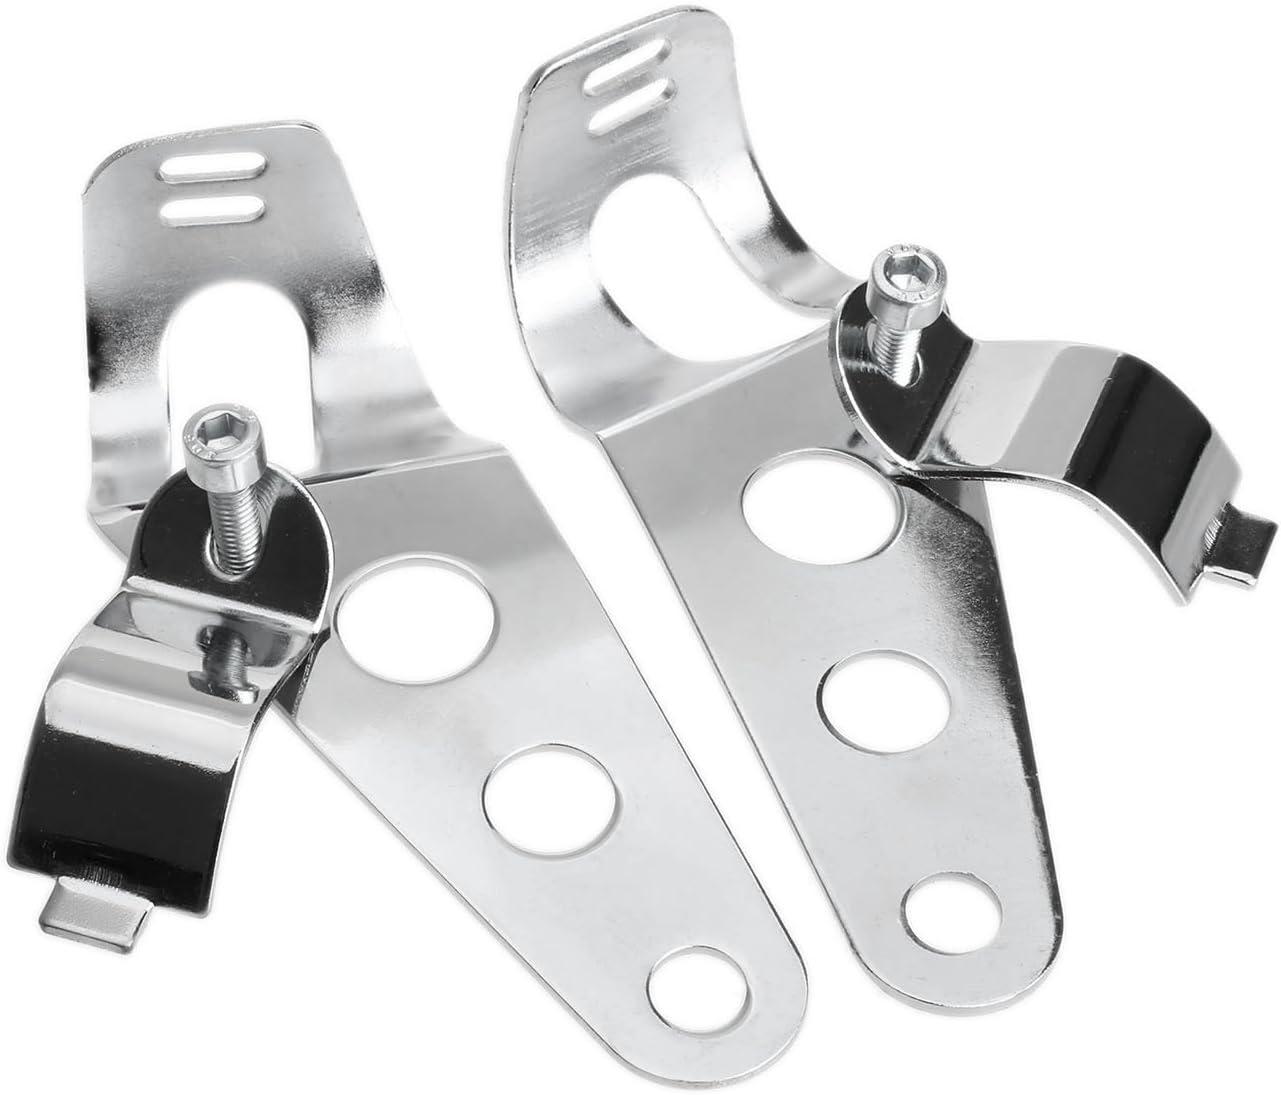 2Pcs Silver Headlight Mount Brackets Fork Ears Motorcycle Bobber Cafe Racer 28mm-34mm